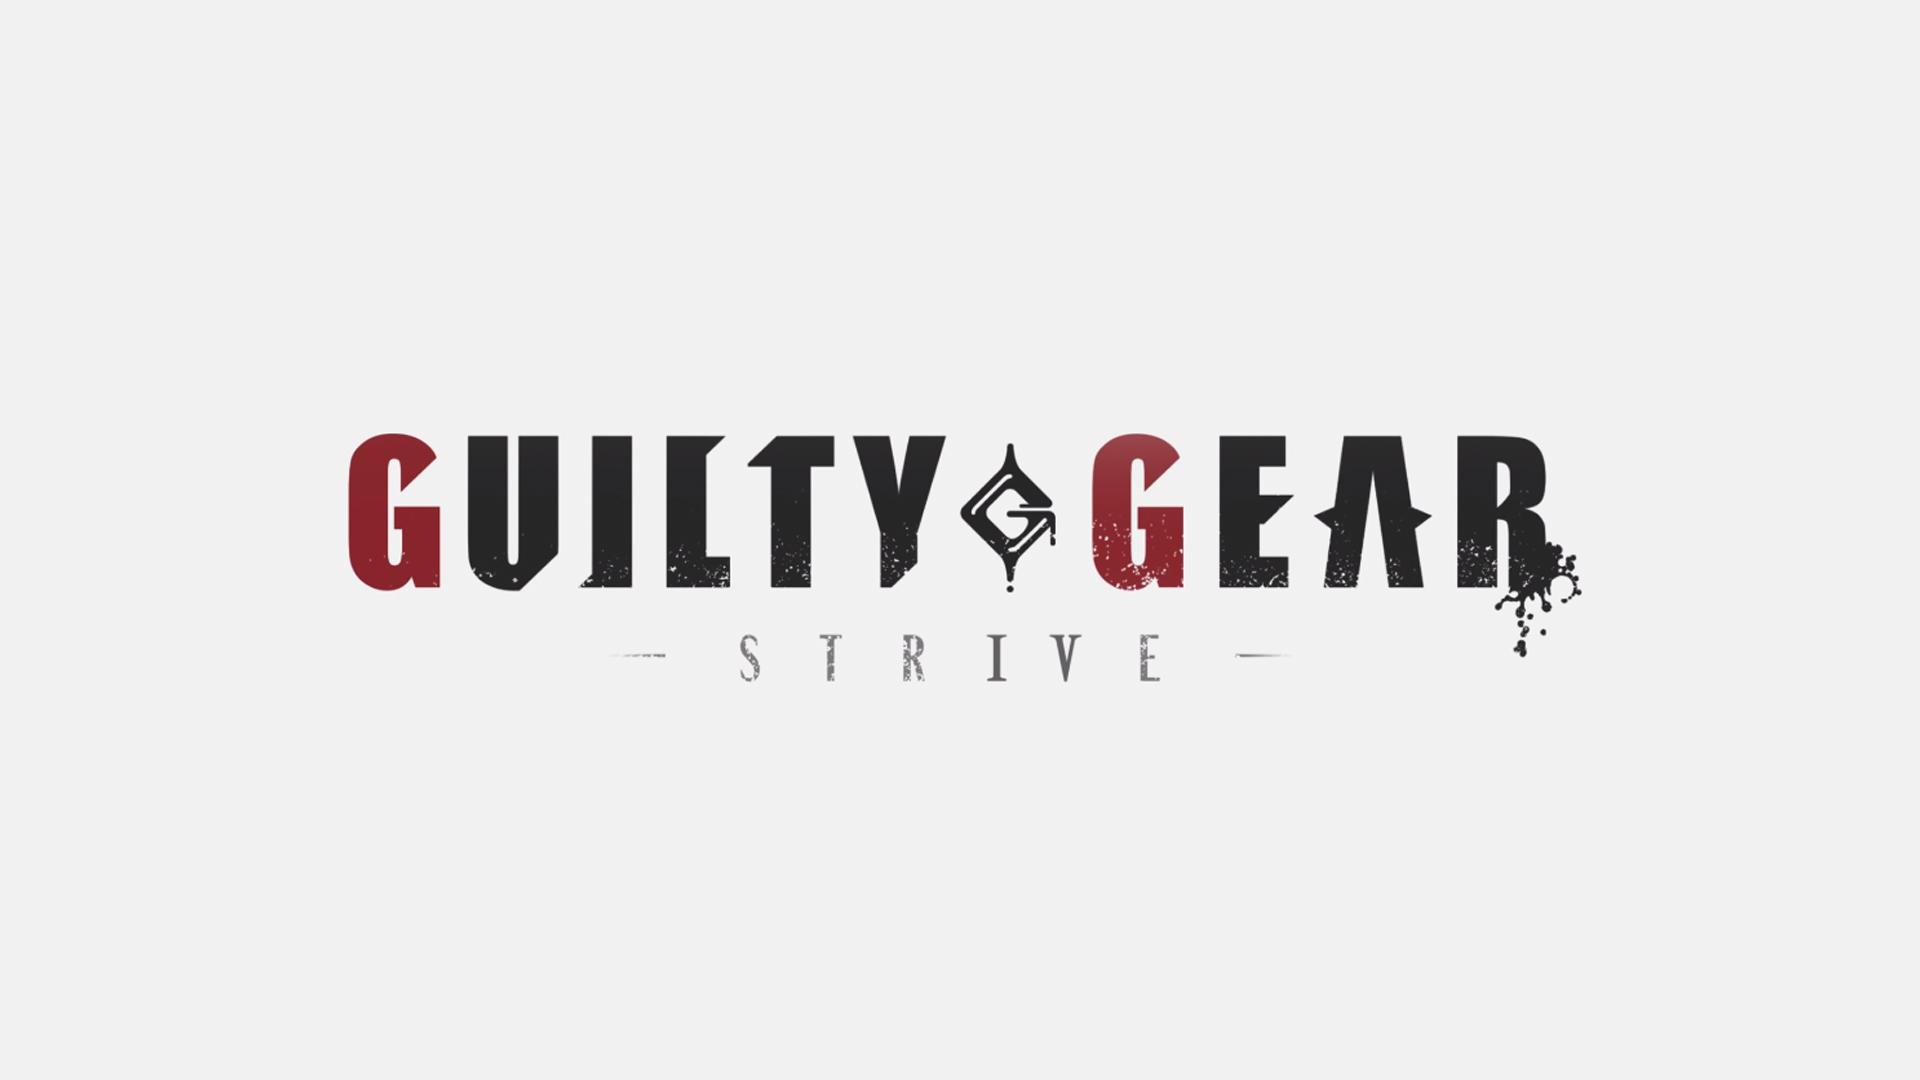 guilty gear strive logo wallpaper 73128